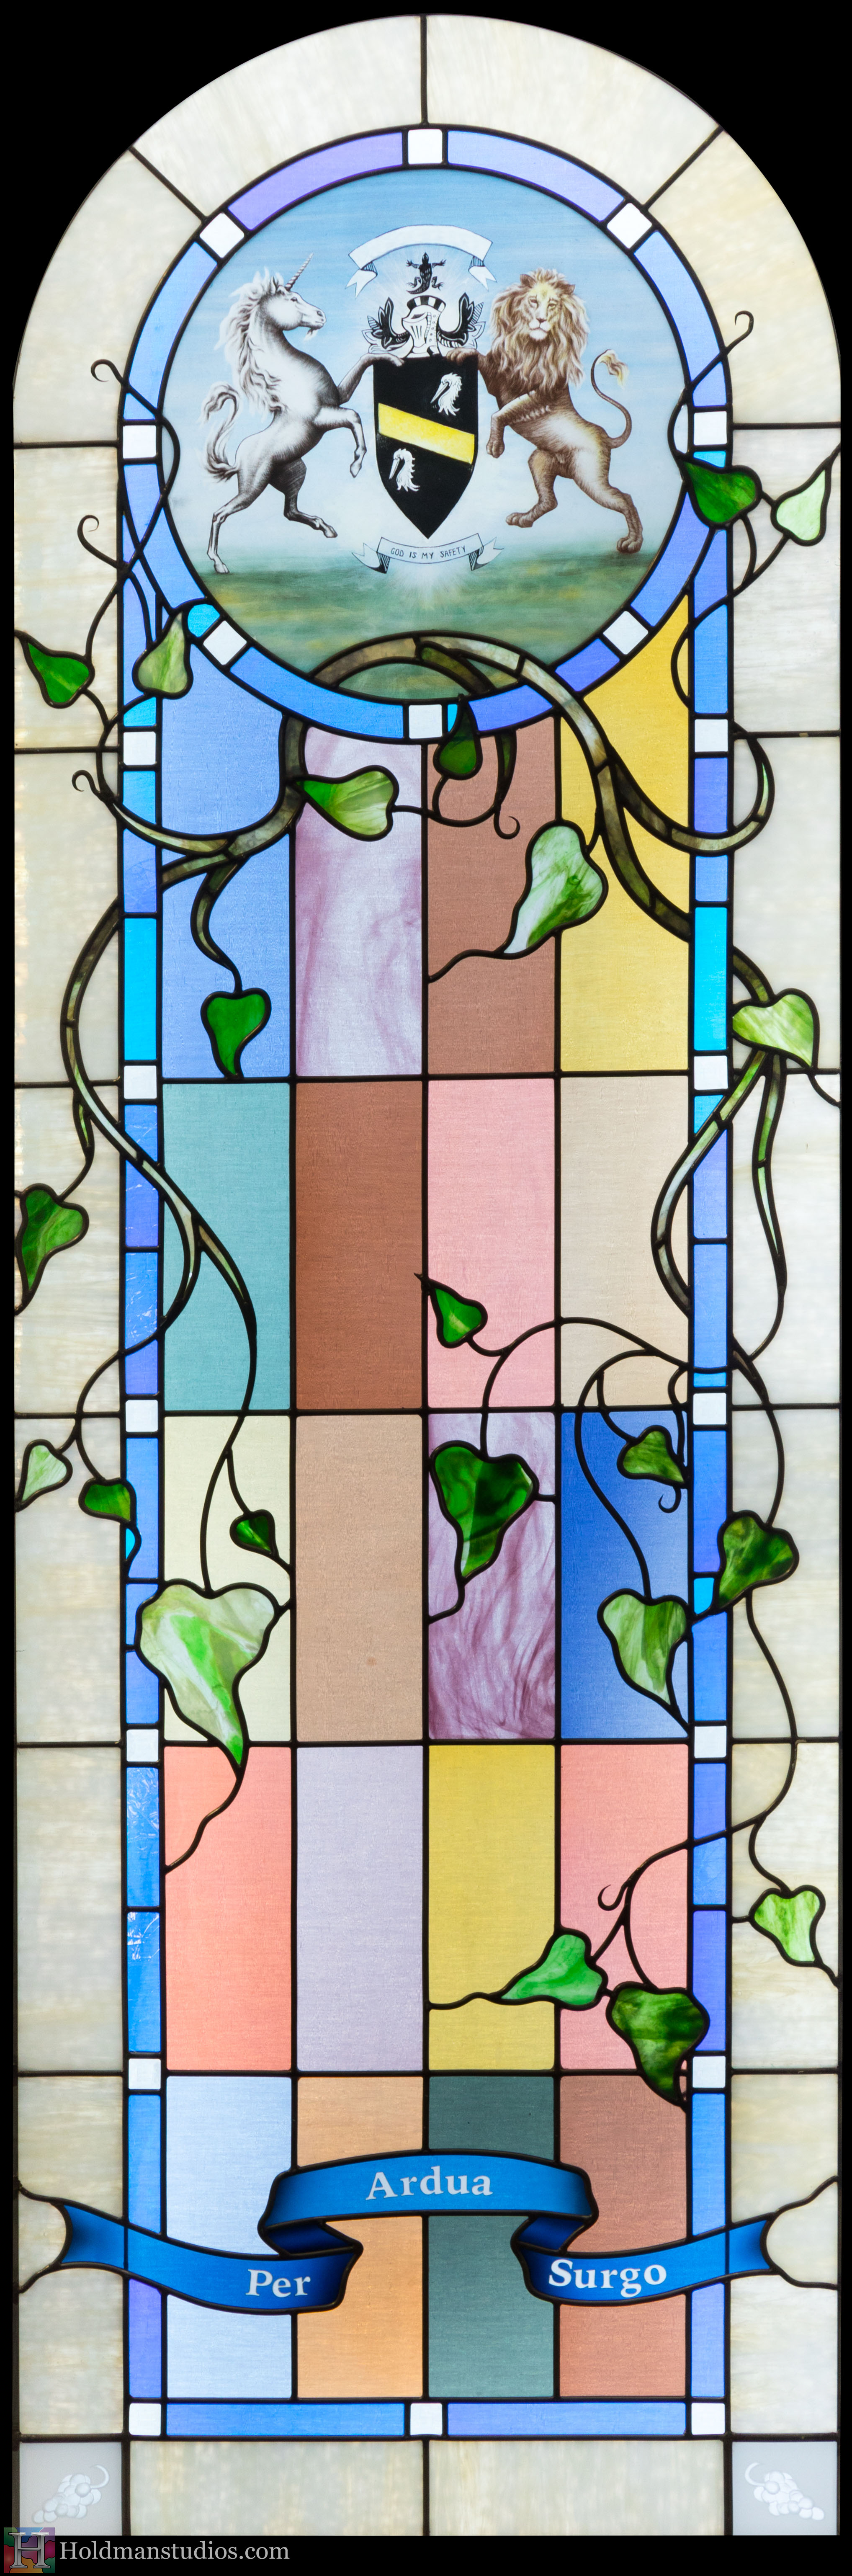 Holdman-studios-stained-glass-study-window-per-ardus-surgo-vine-leaves-plants-lion-unicorn-coat-of-arms-closeup.jpg